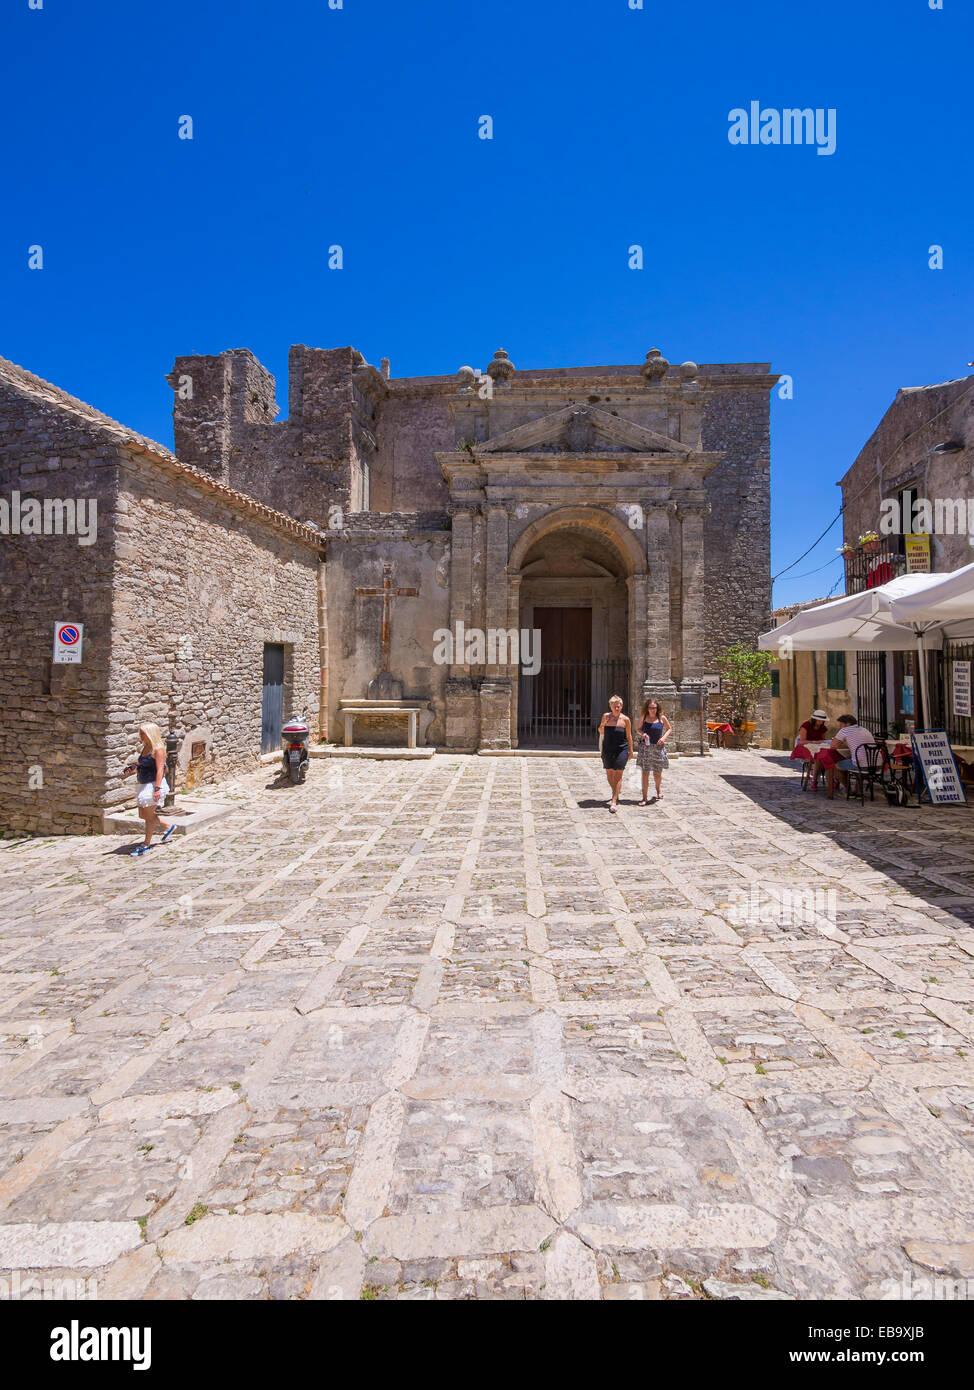 The Church of S. Cataldo, historic centre, Erice, Province of Trapani, Sicily, Italy - Stock Image